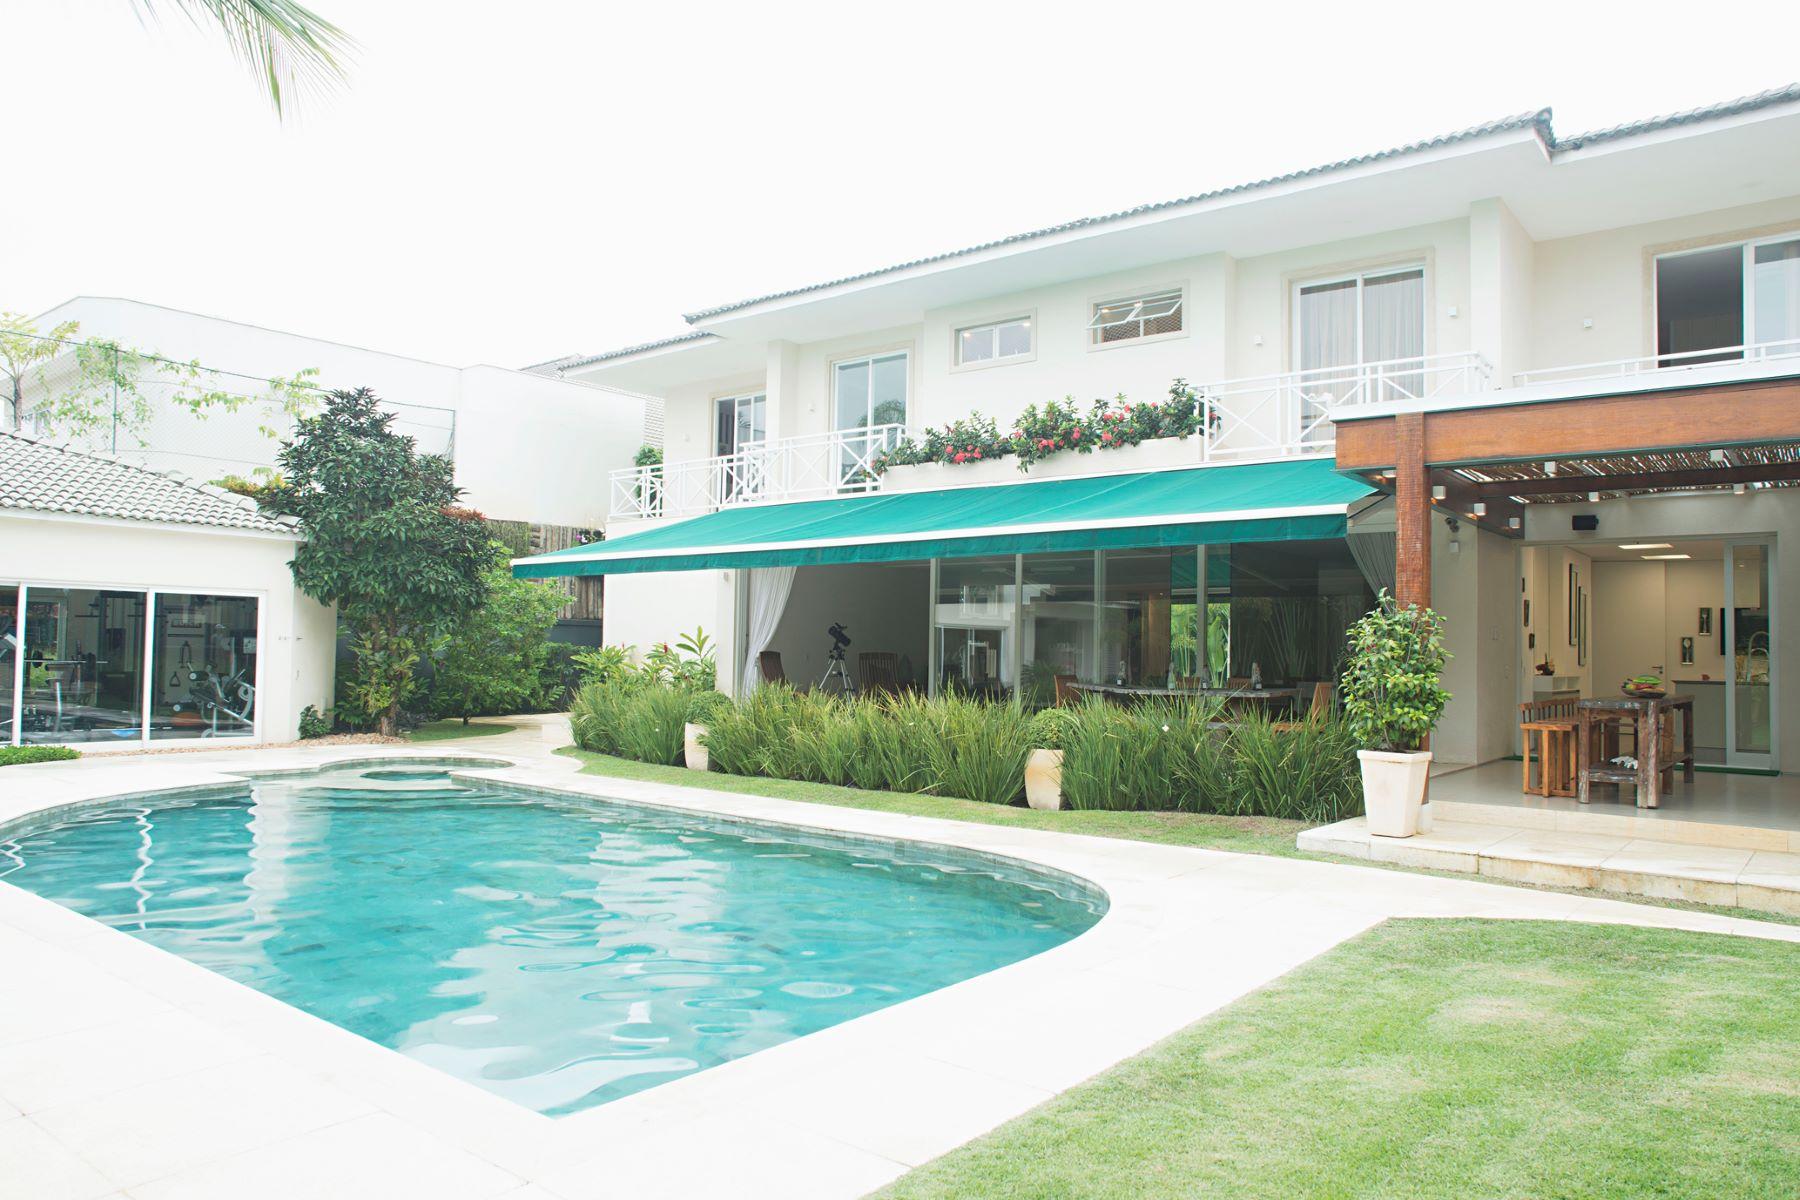 Maison unifamiliale pour l Vente à Great External Spaces Rua Mesquitinha Rio De Janeiro, Rio De Janeiro, 22793-297 Brésil